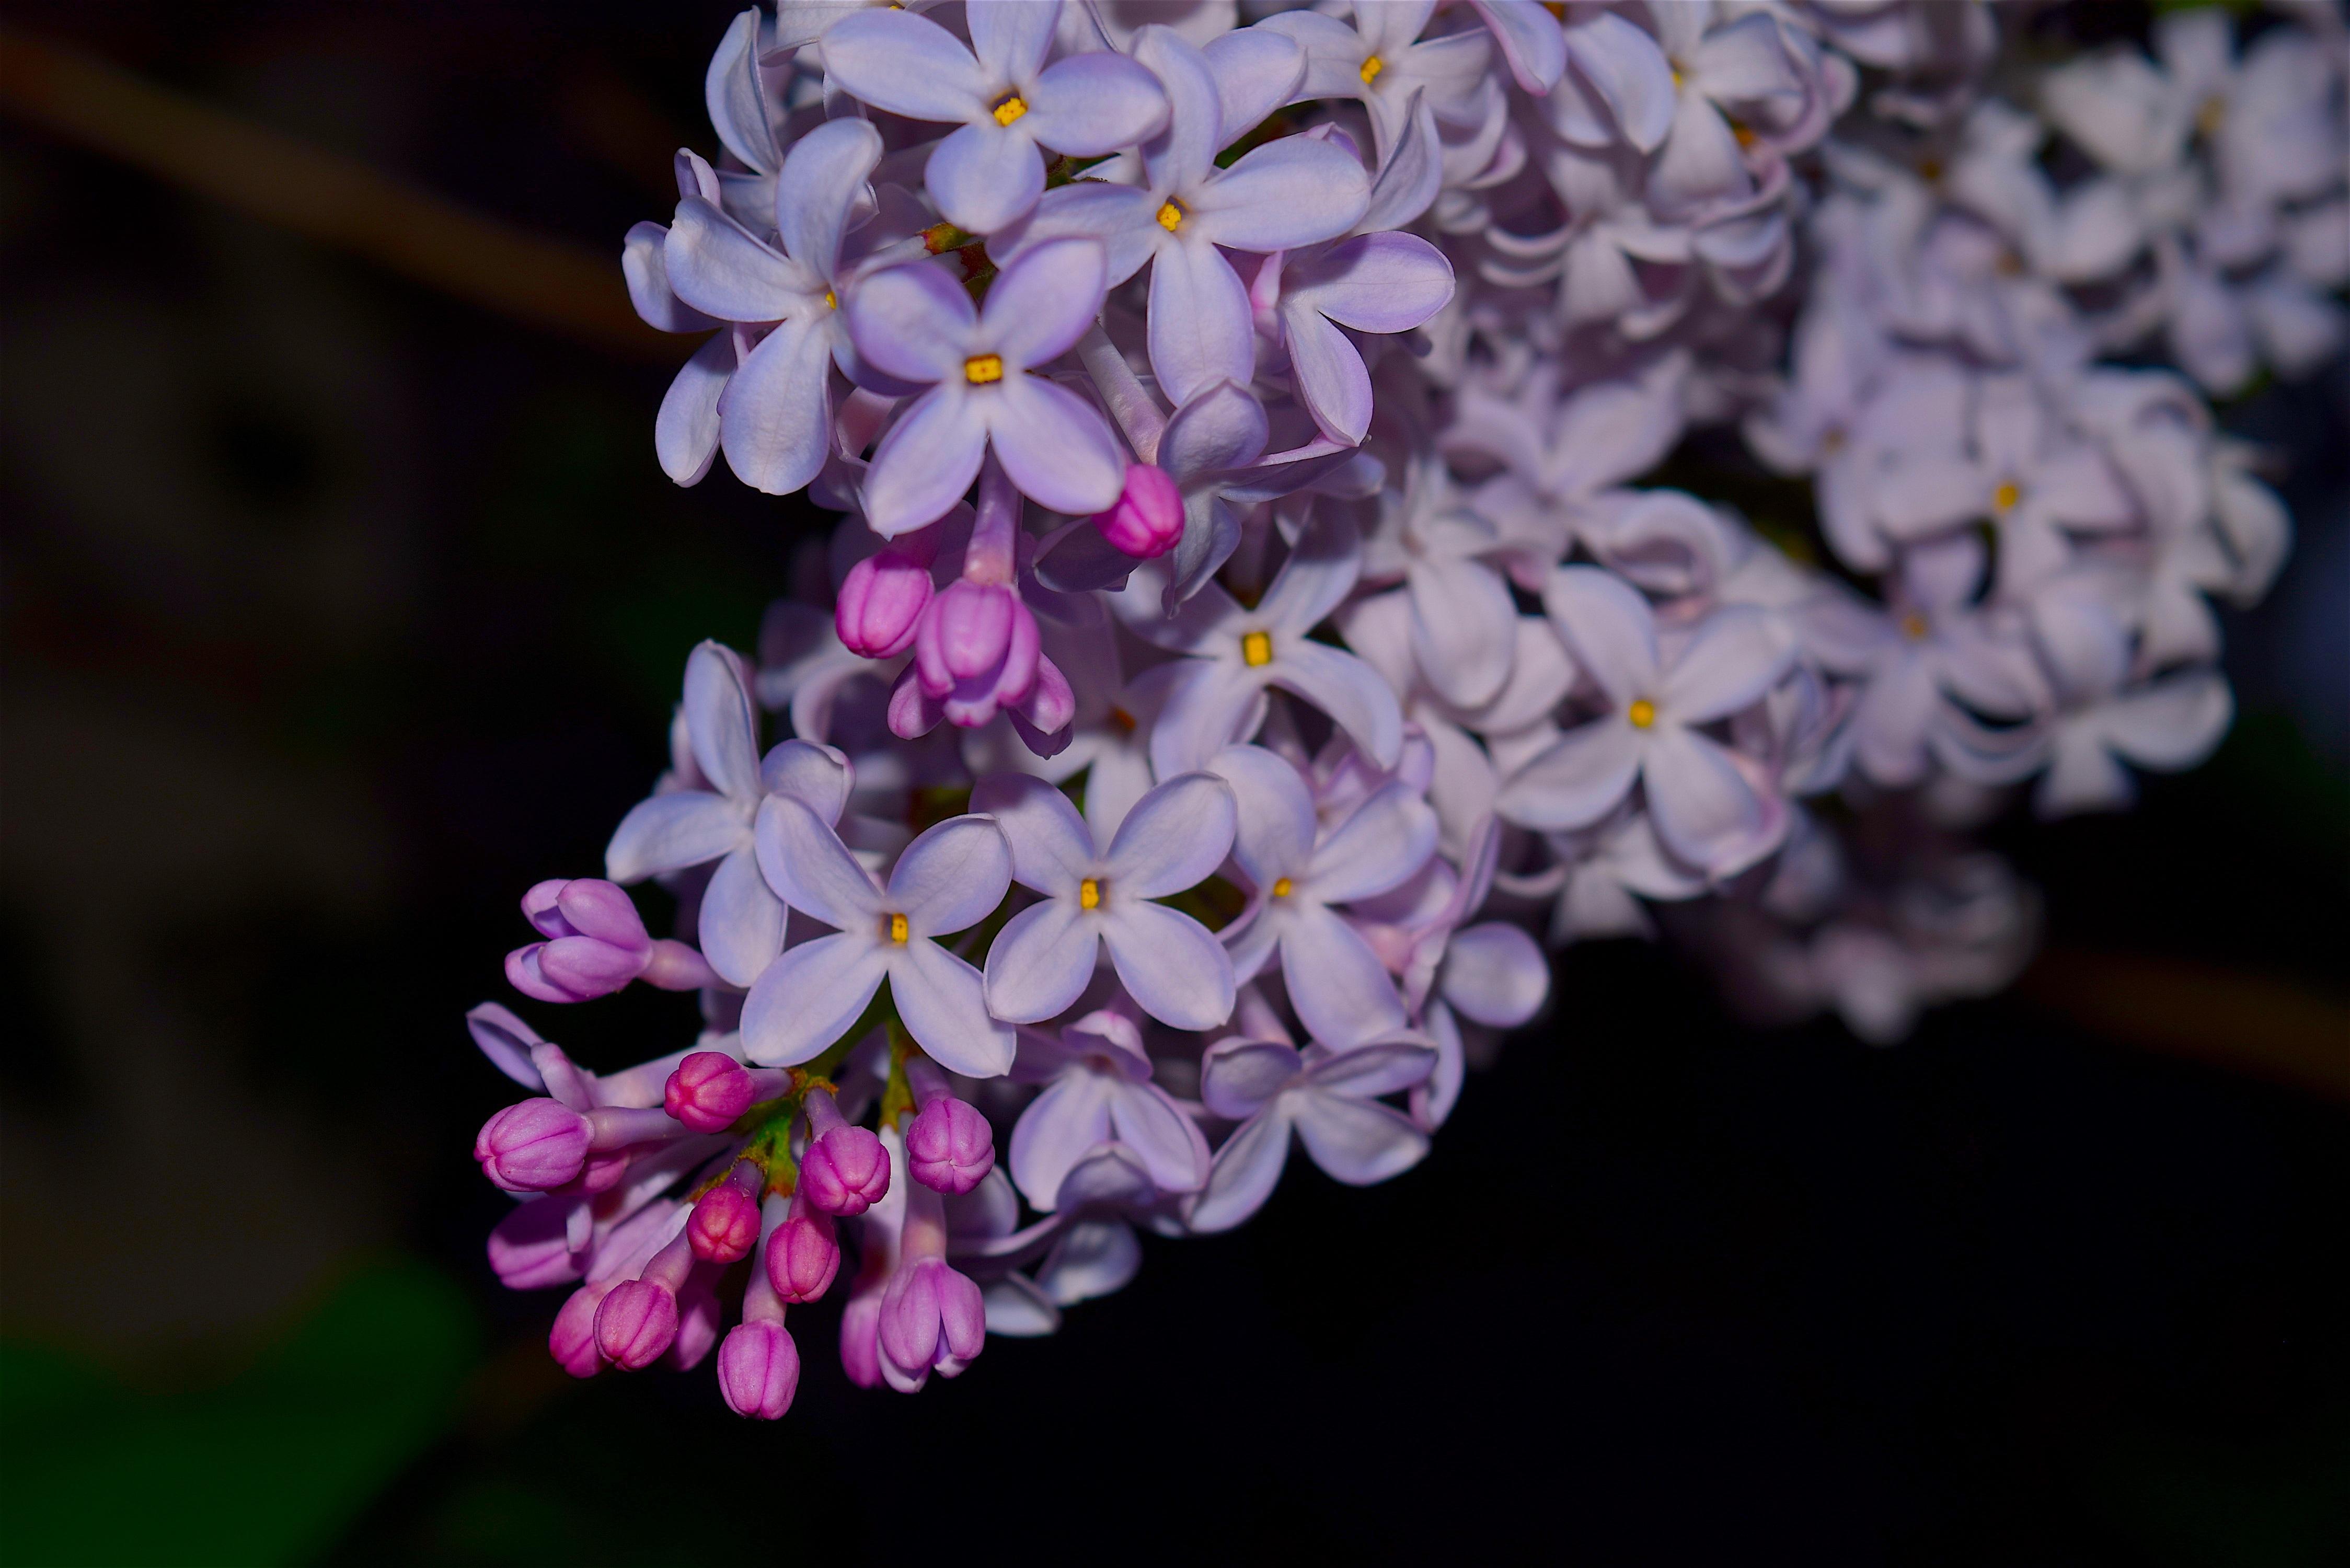 lilac flowers 4k 1606508765 - Lilac Flowers 4k - Lilac Flowers 4k wallpapers